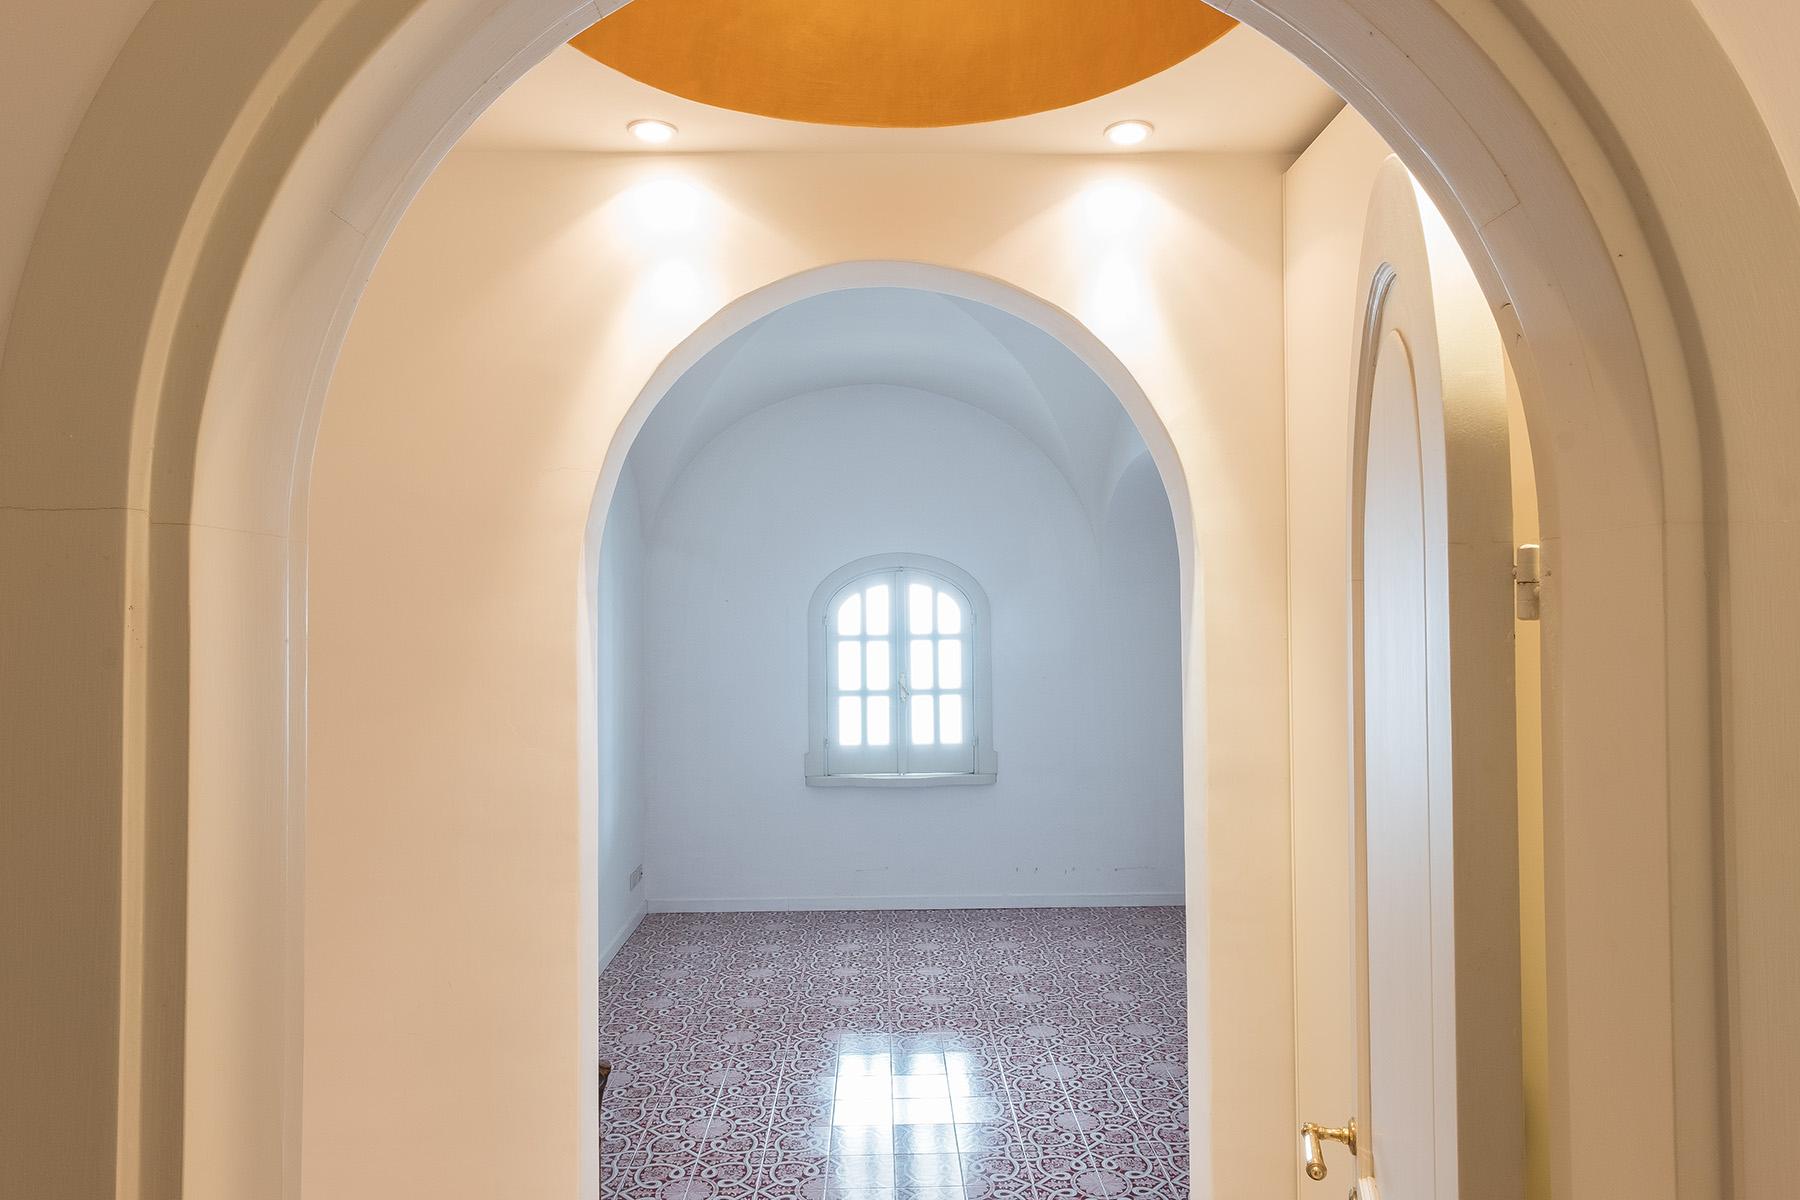 Casa indipendente in Vendita a Praiano: 4 locali, 250 mq - Foto 22